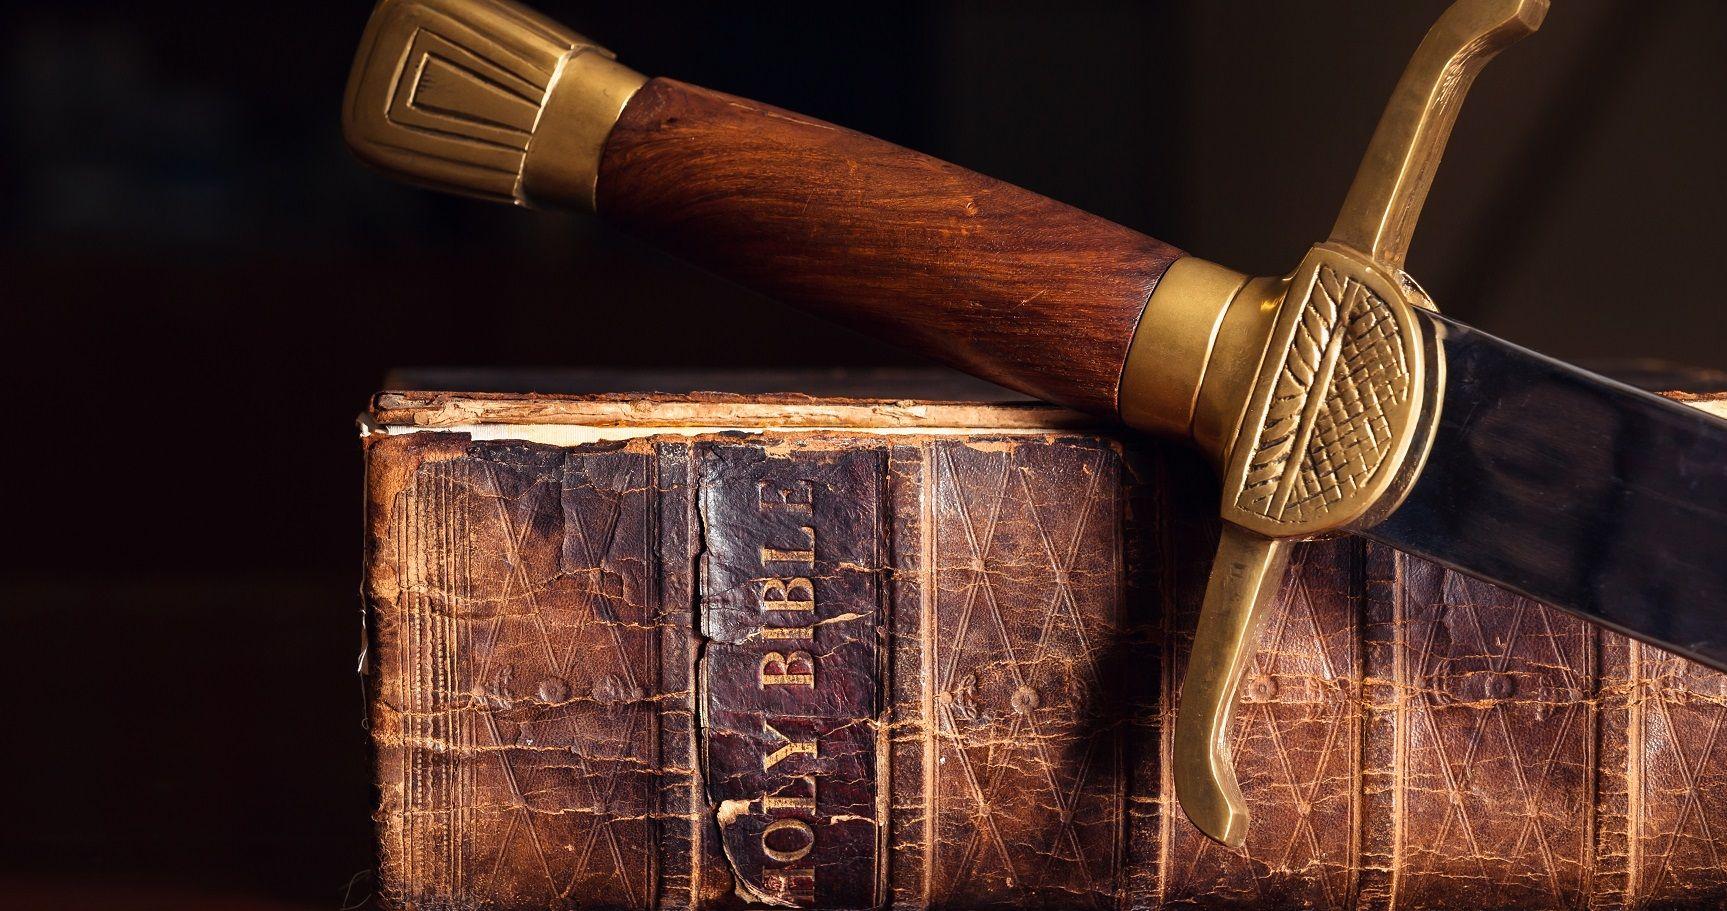 10 Teachings the Bible Got Horribly Wrong